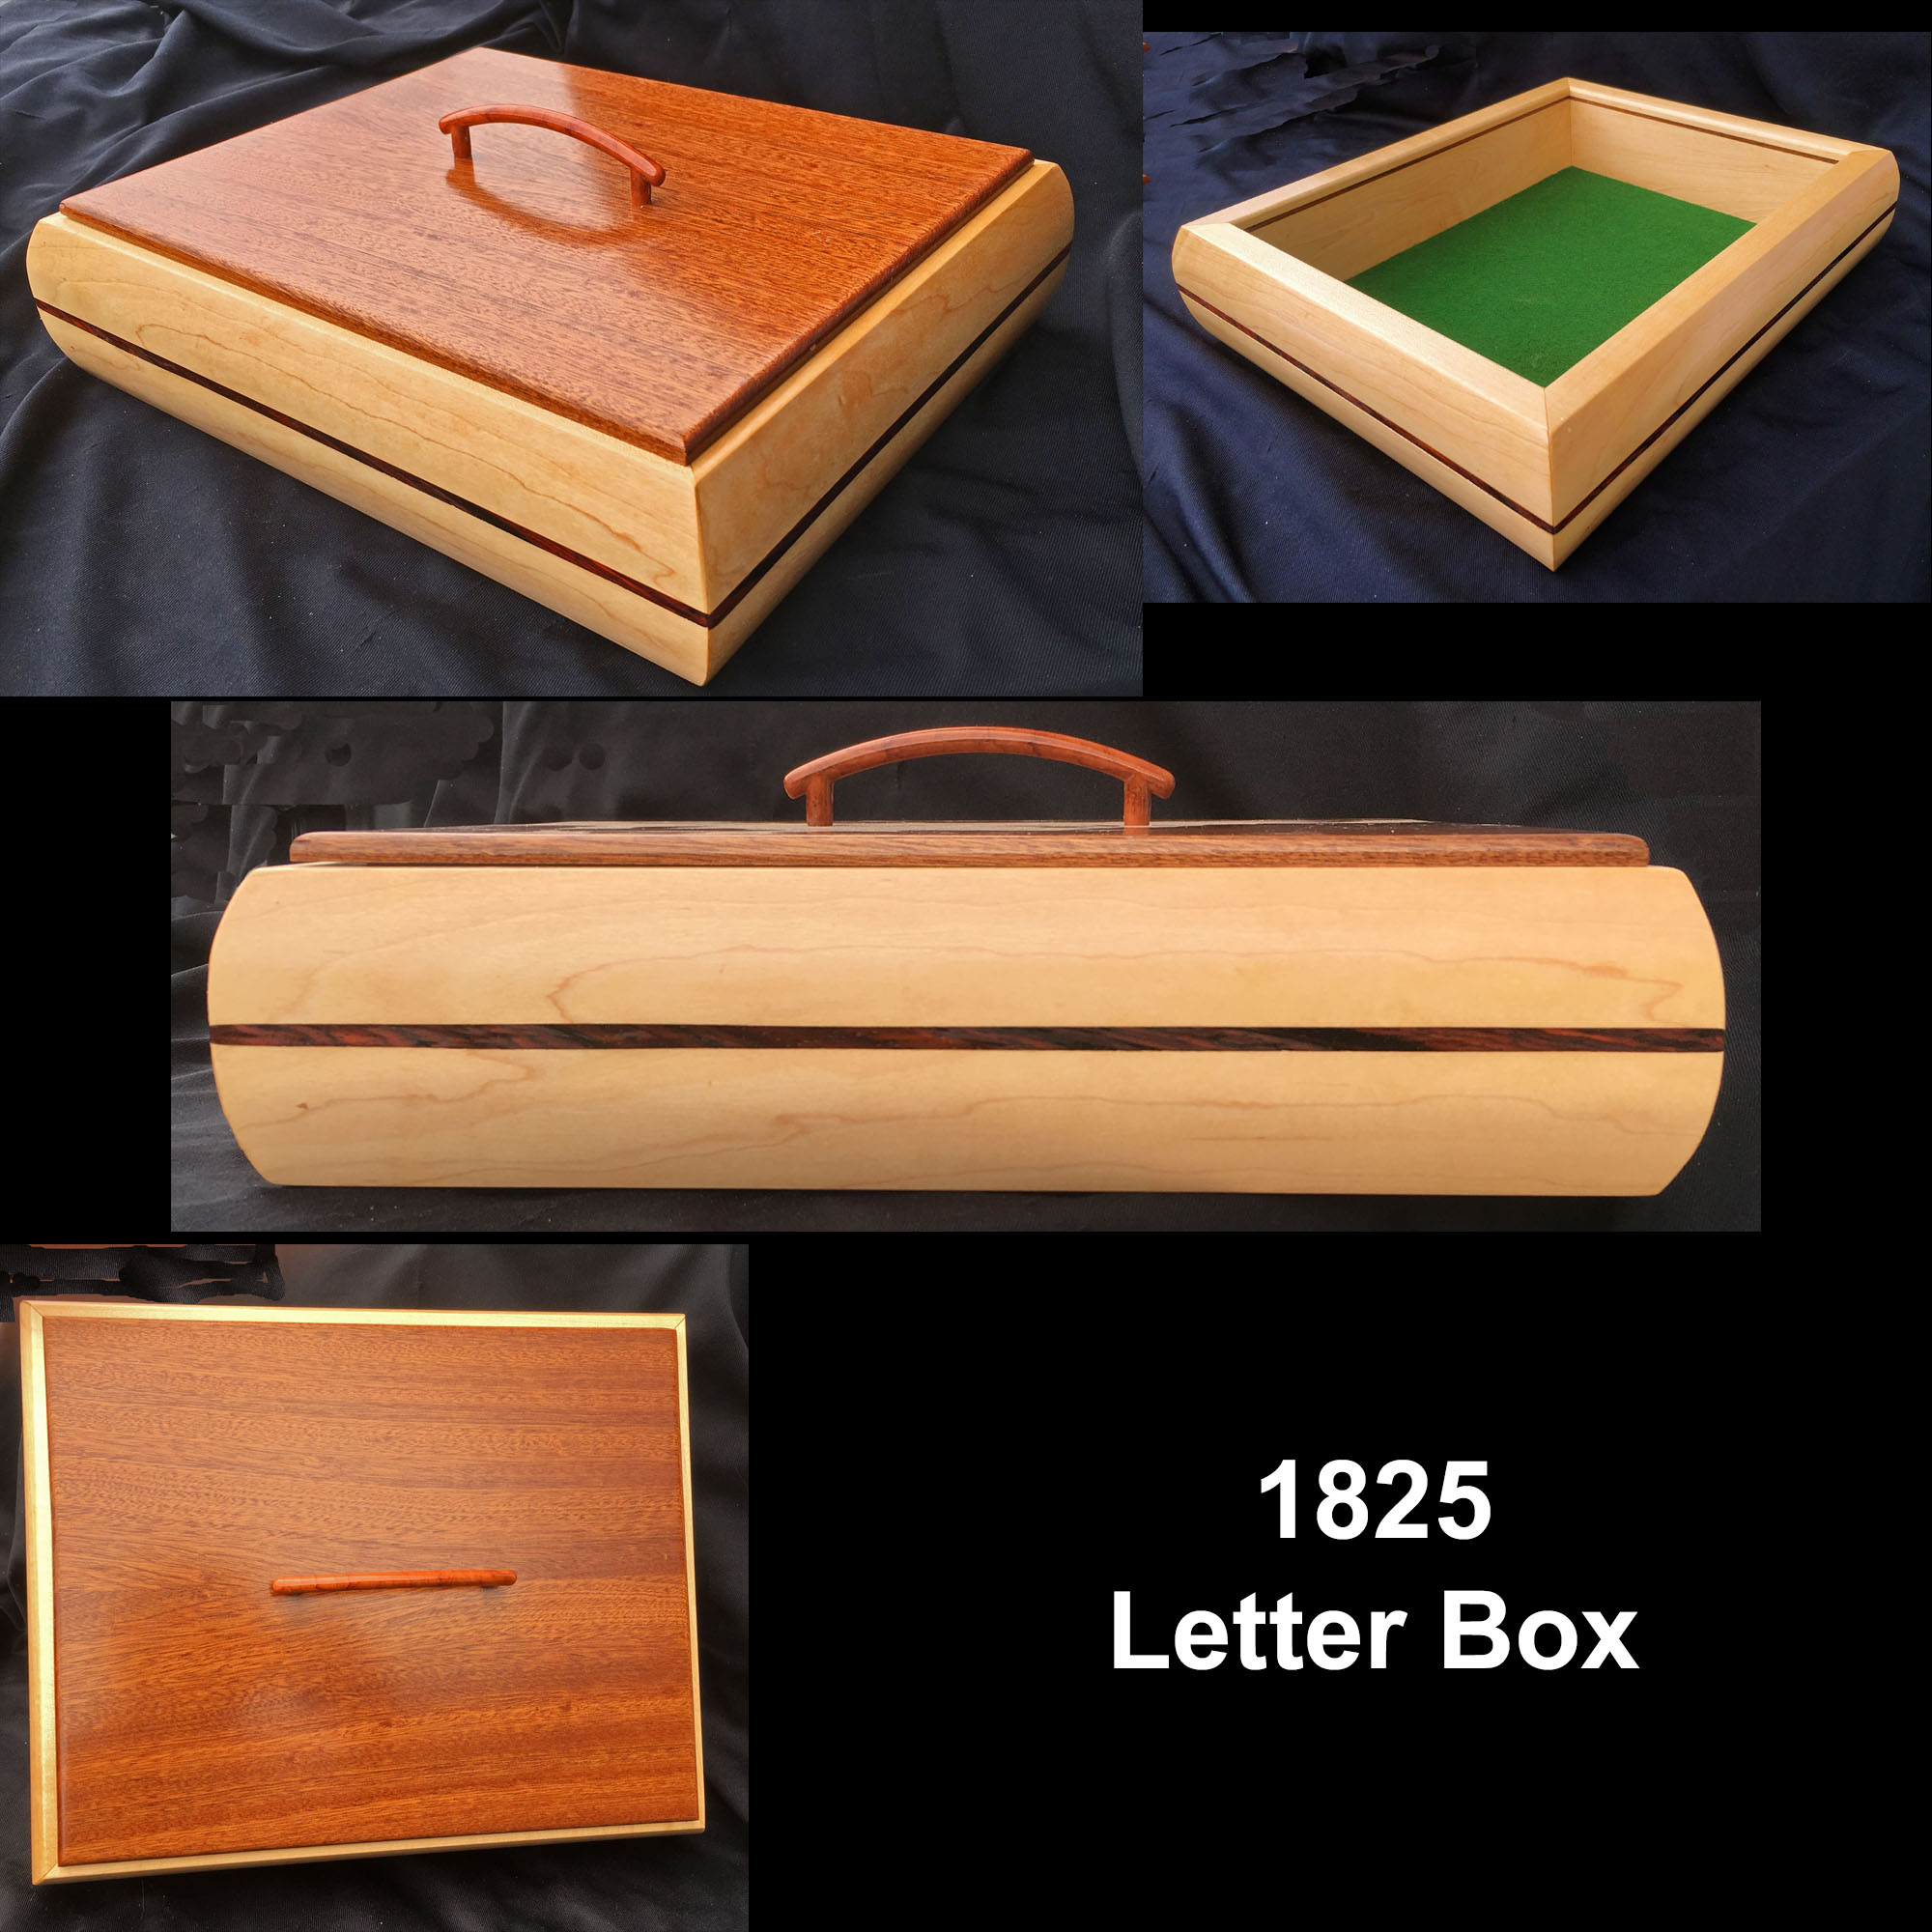 Hinged lid 9 x 12 x 4 12 5th Anniversary Wedding gift JSL107 Lined trays Birthday Jewelry Box Handcrafted wood Sapele hardwood